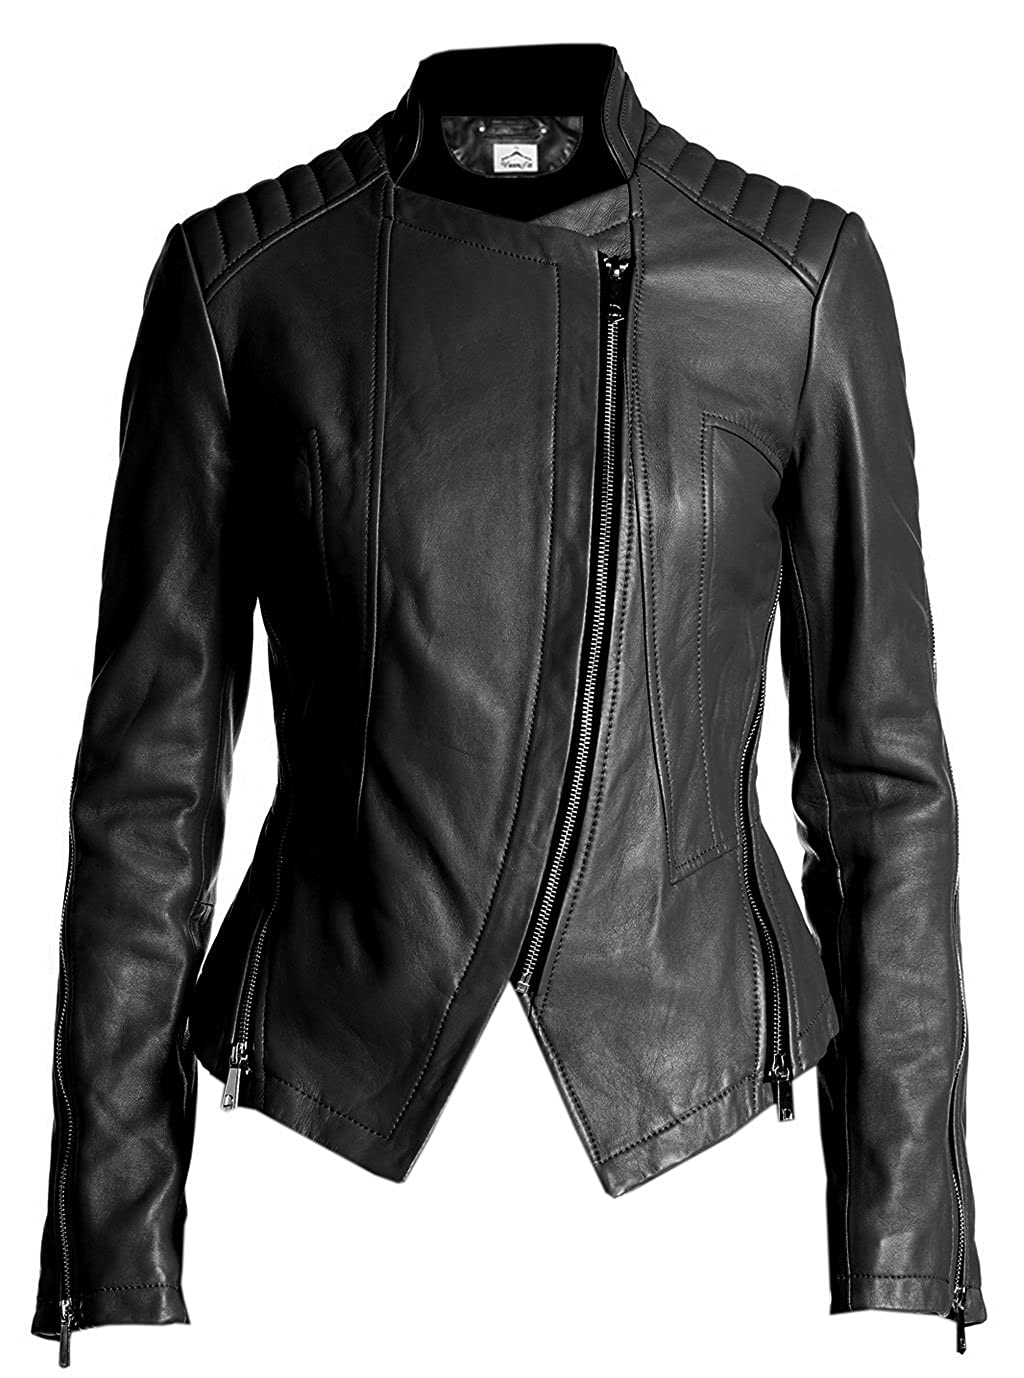 VearFit Tranqum Moto Clasic Real Leather Jacket for Women Winter Biker HF16-W27